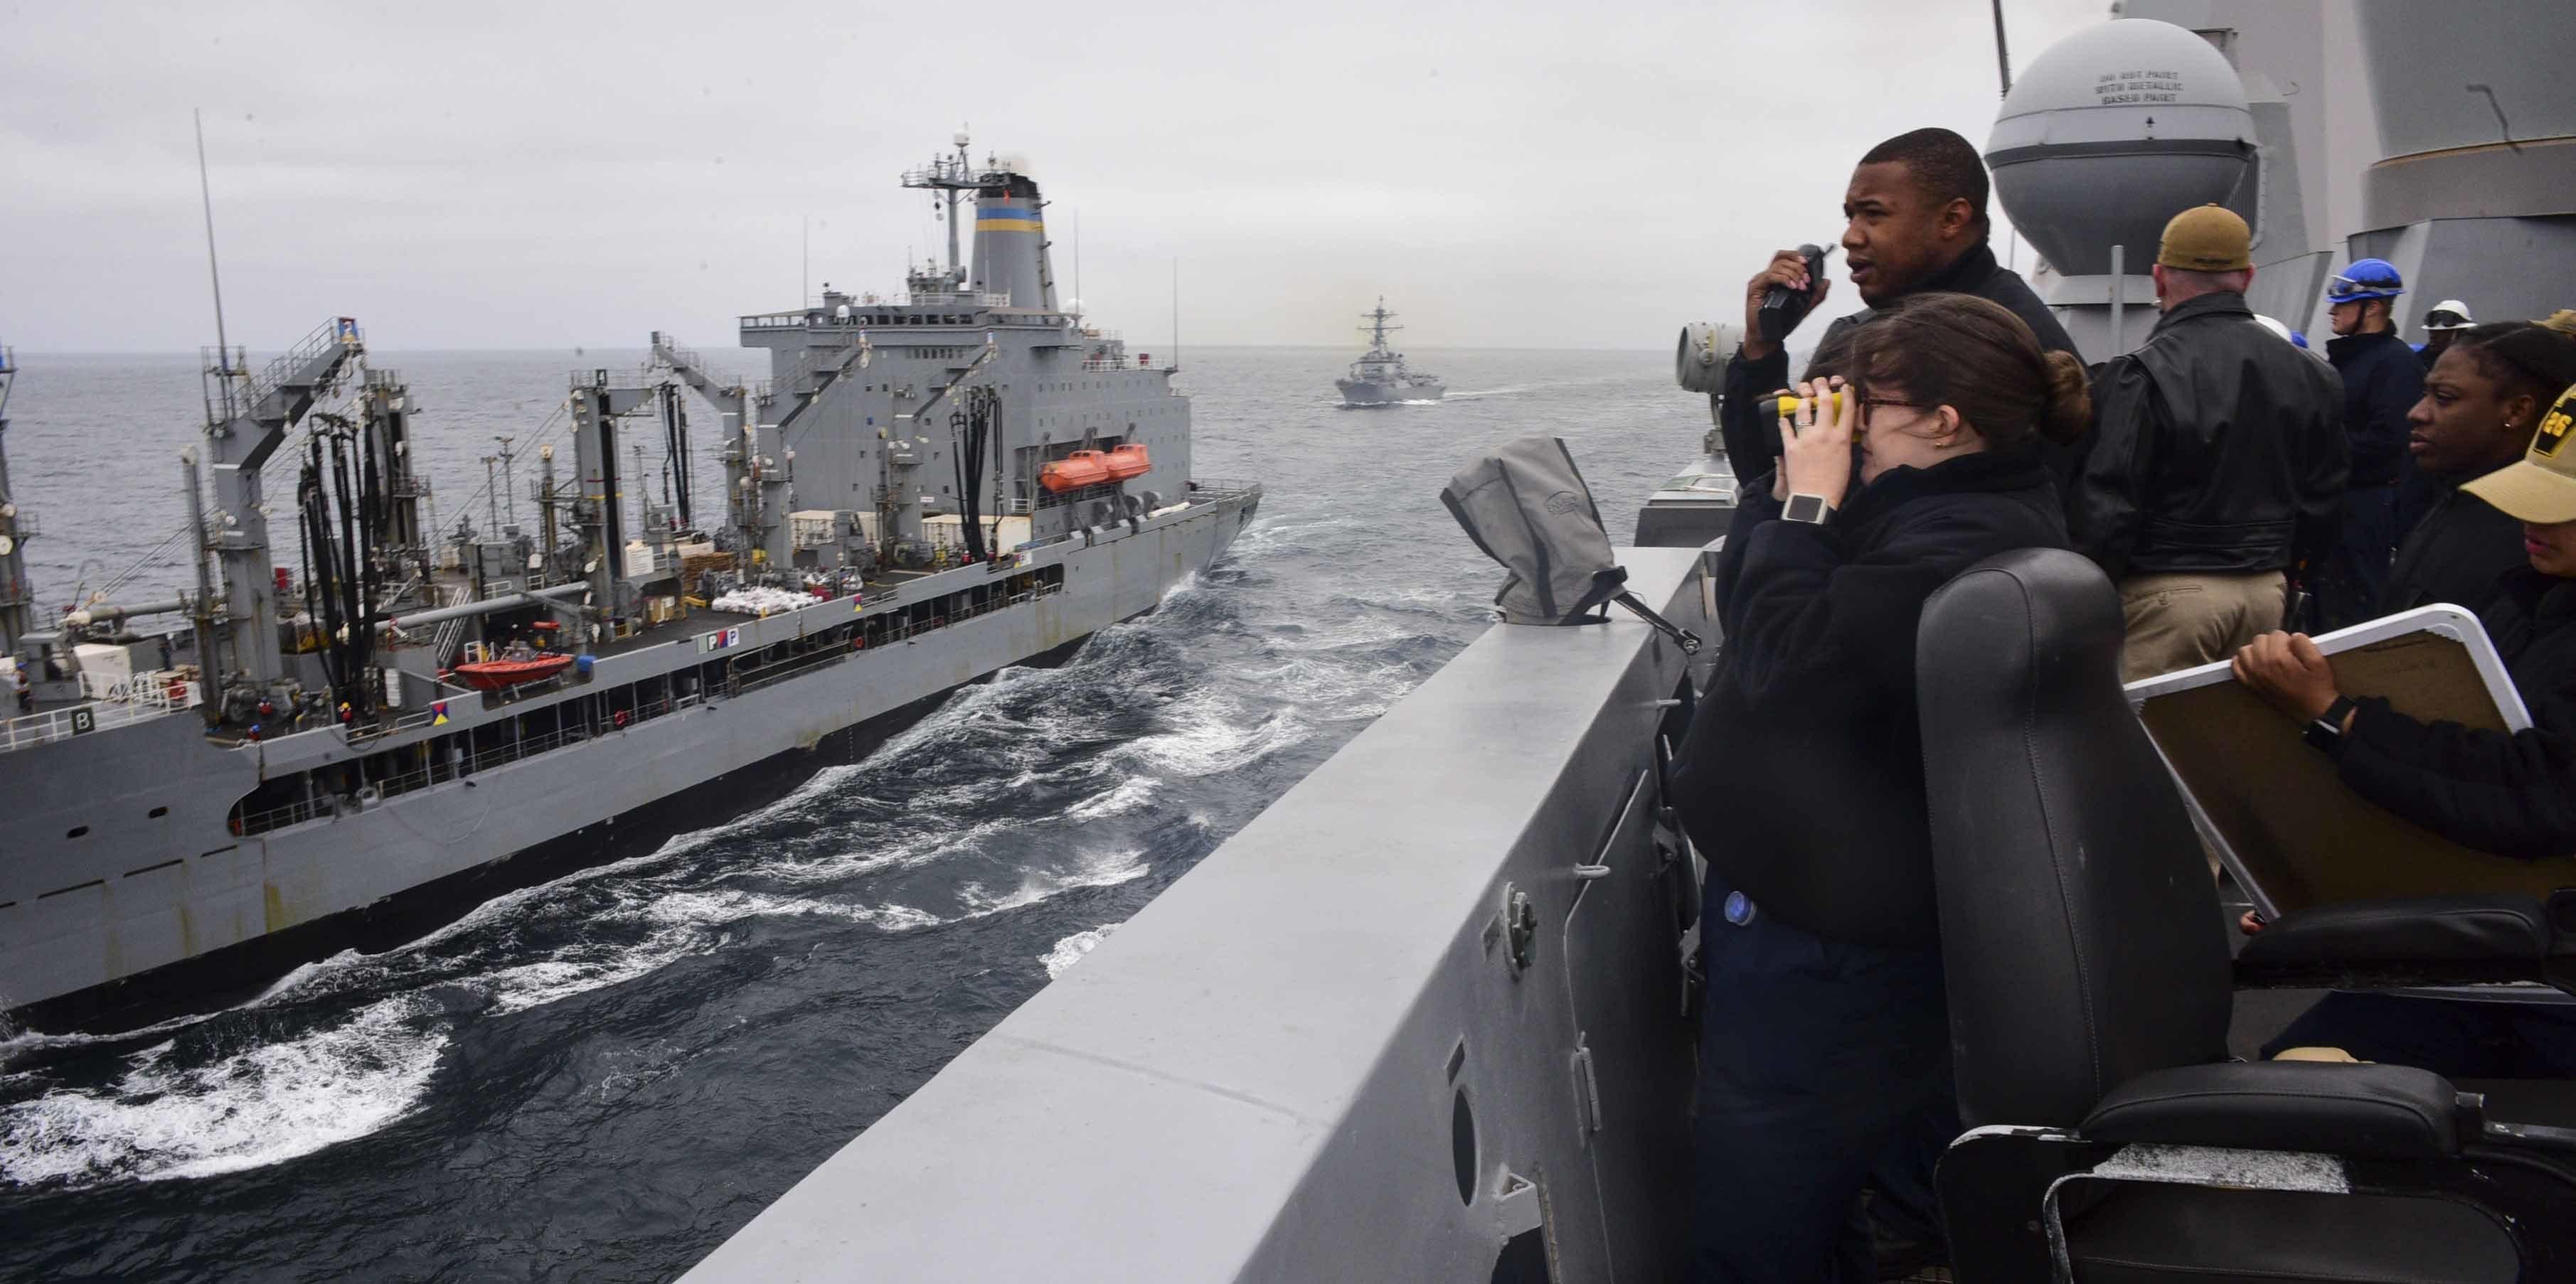 Sailors aboard the amphibious transport dock ship USS John P. Murtha (LPD 26) stand watch on the bridge